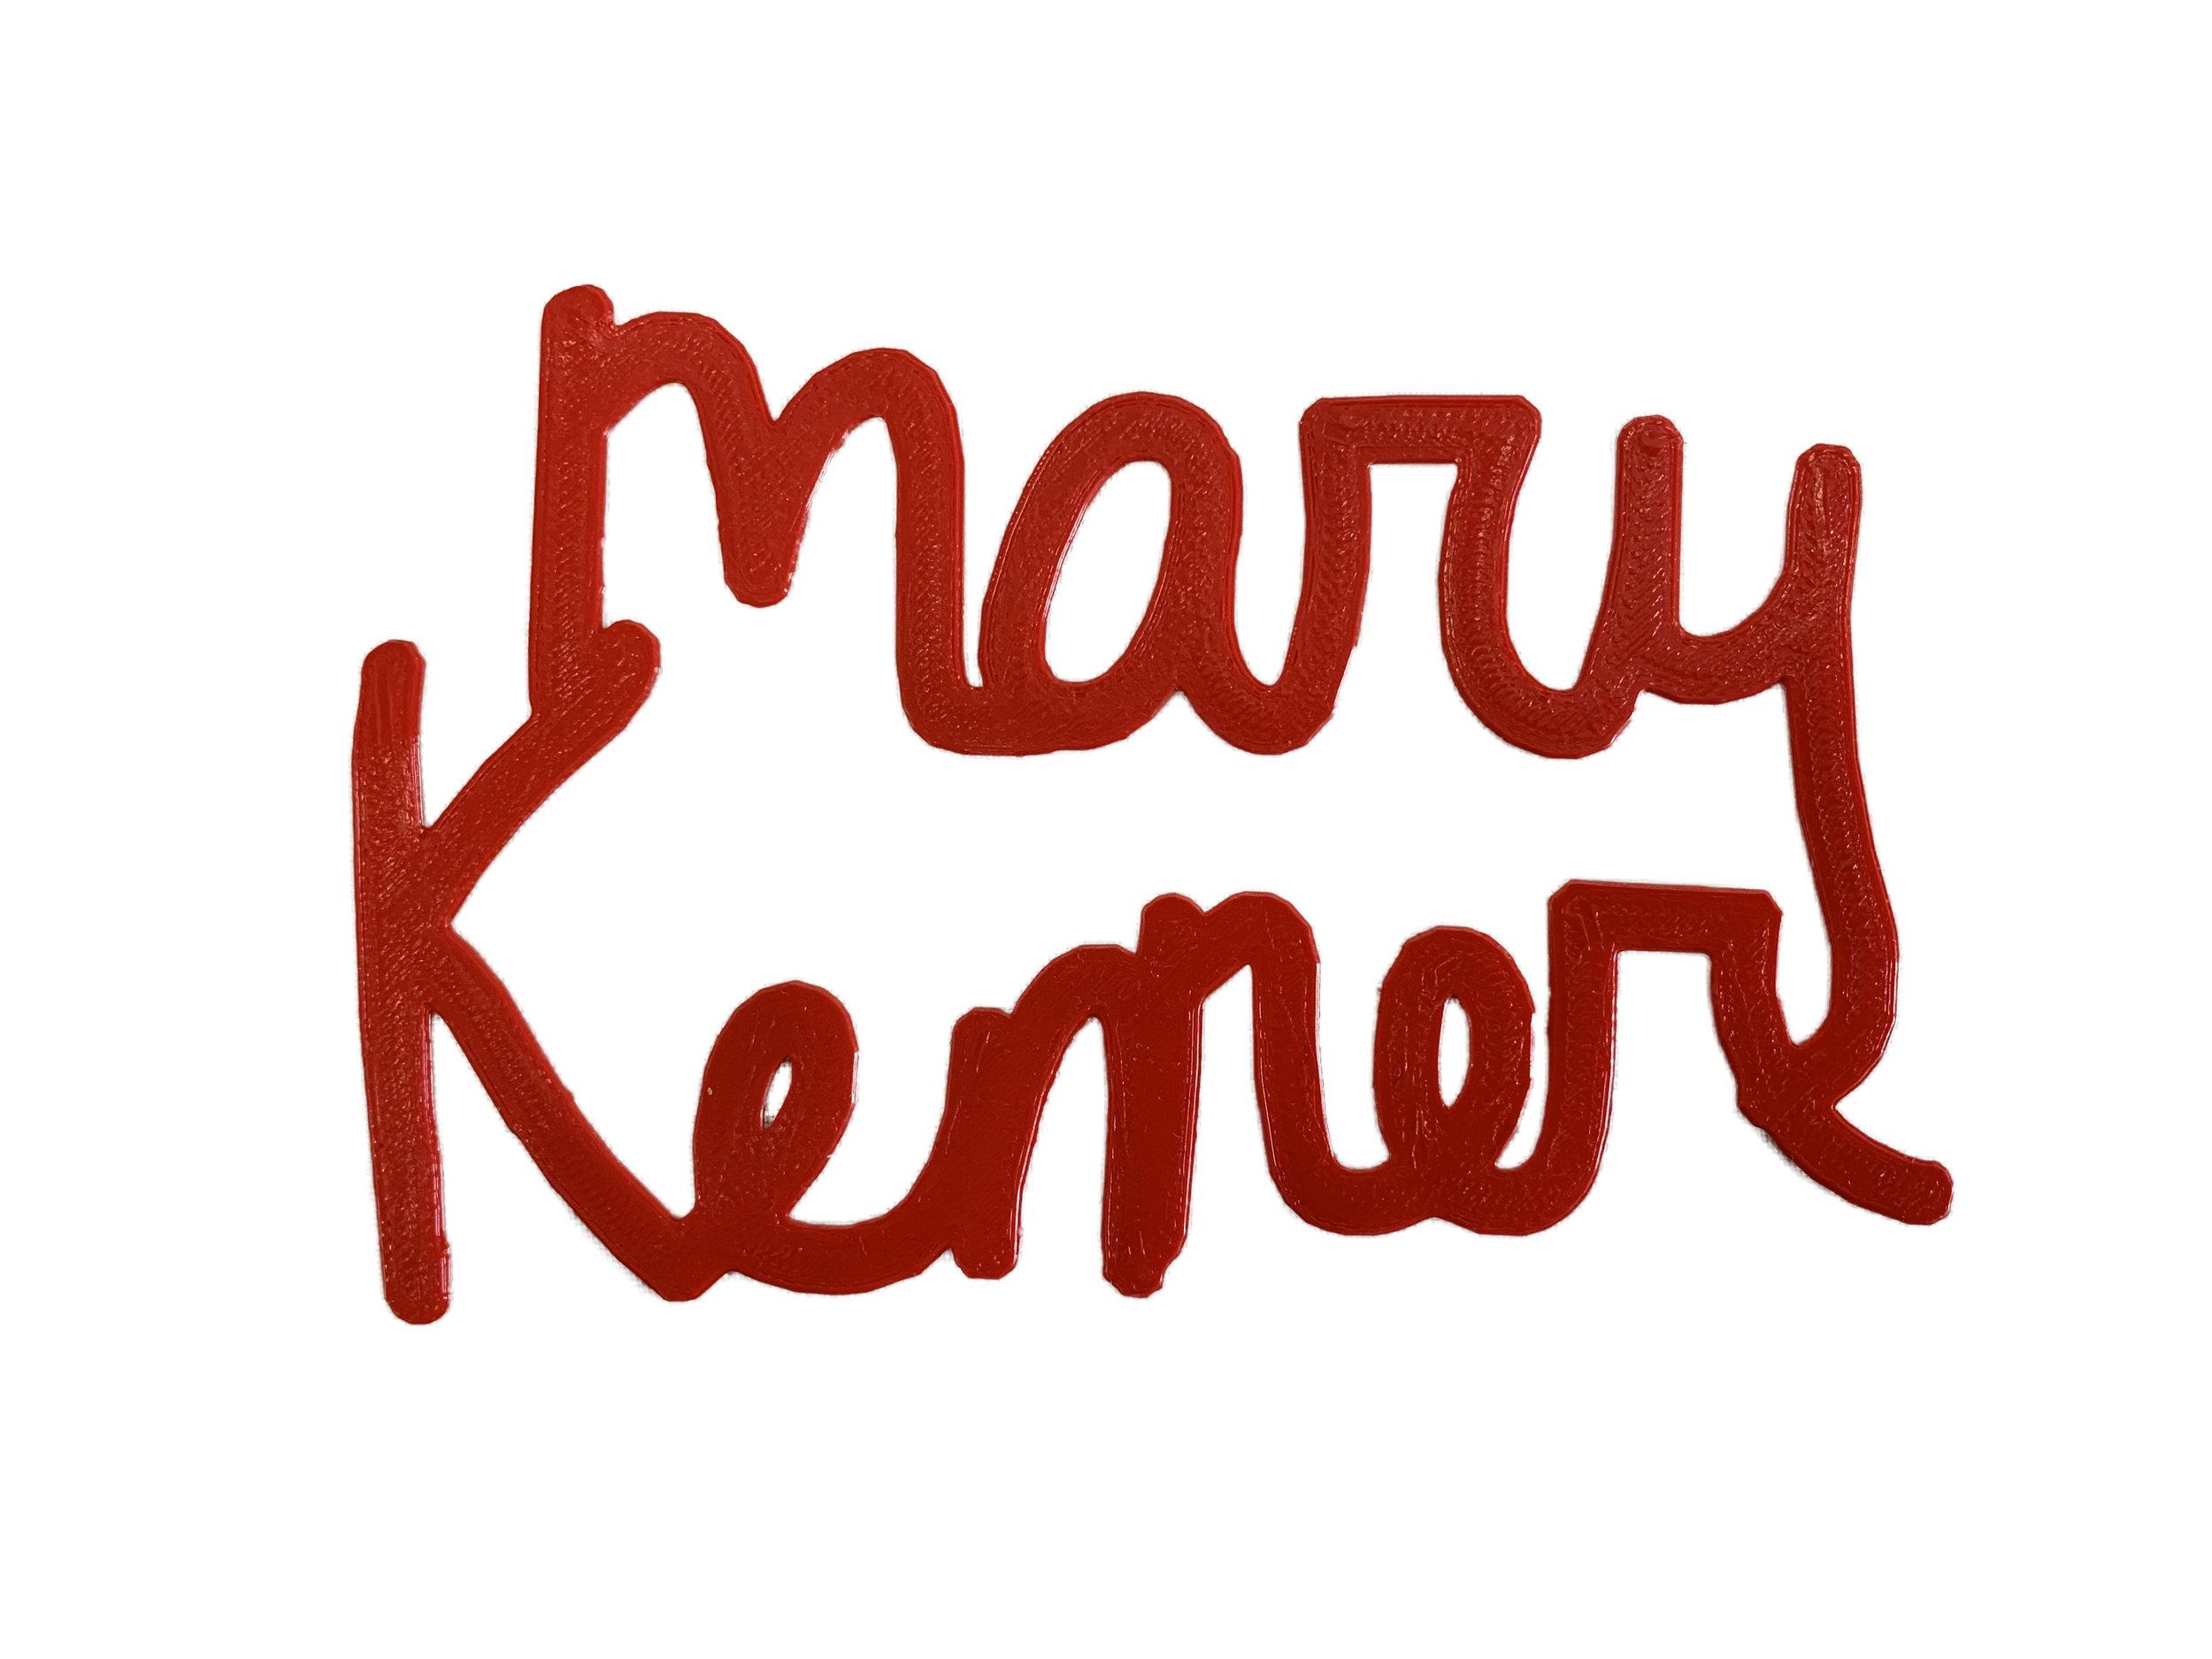 Mary KennerNoBackground.jpg